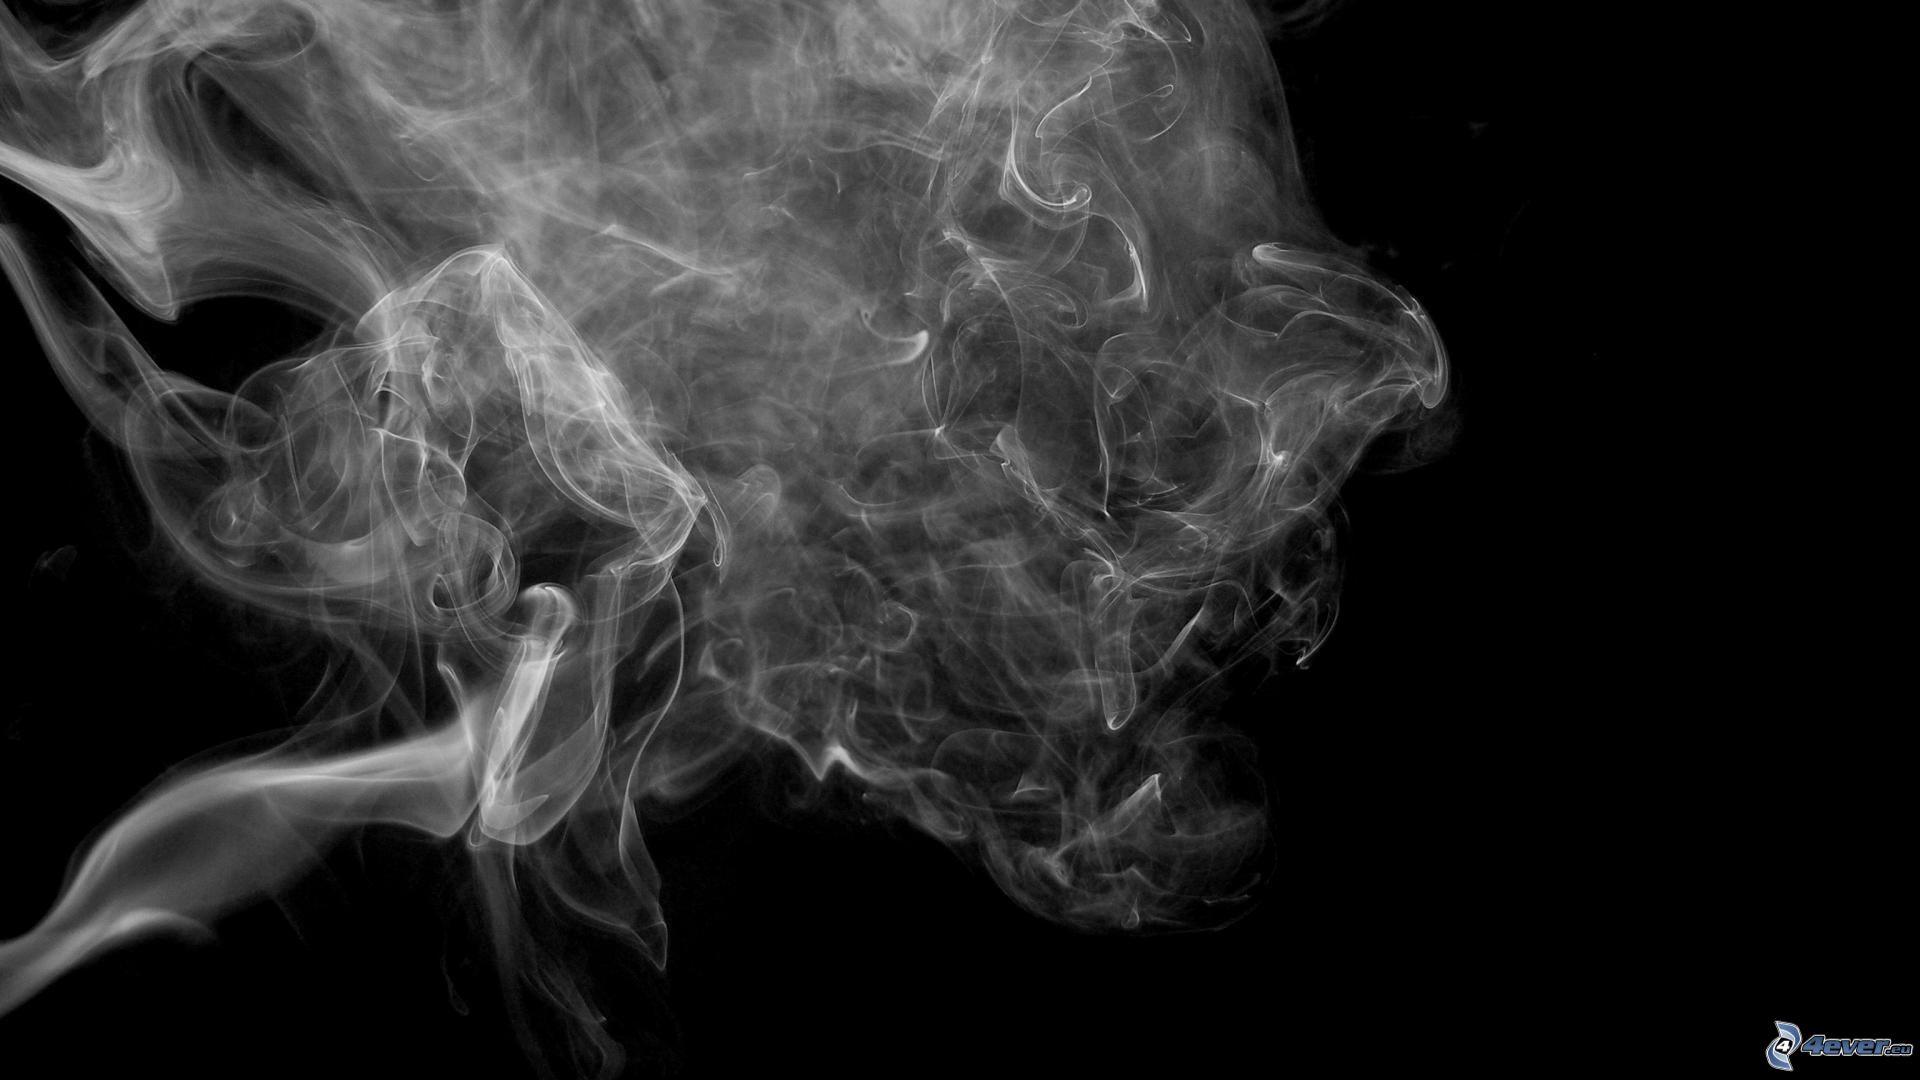 Rauch Cigarette Smoke Wallpaper Hd